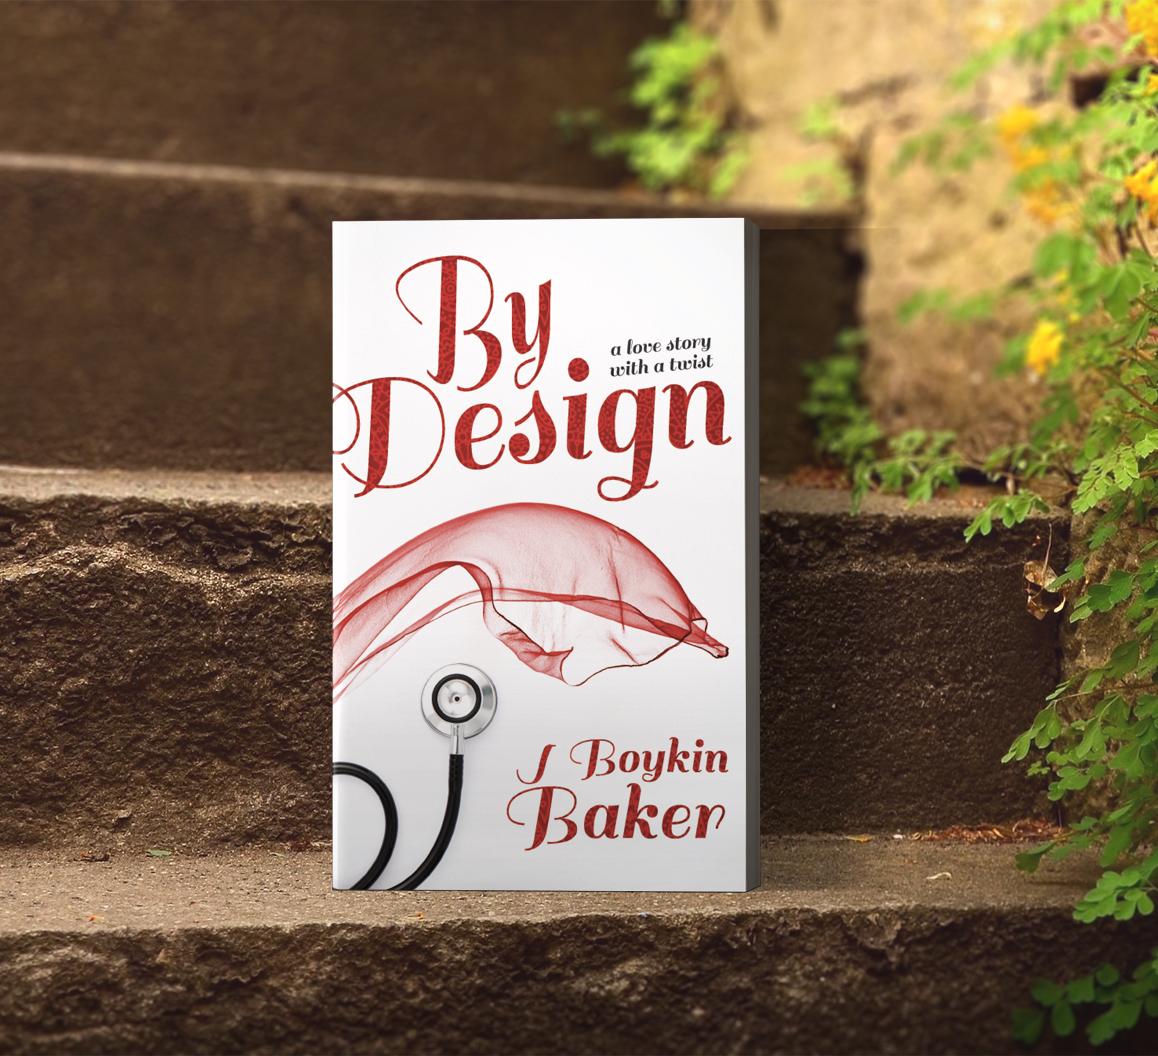 By Design_on steps.jpg